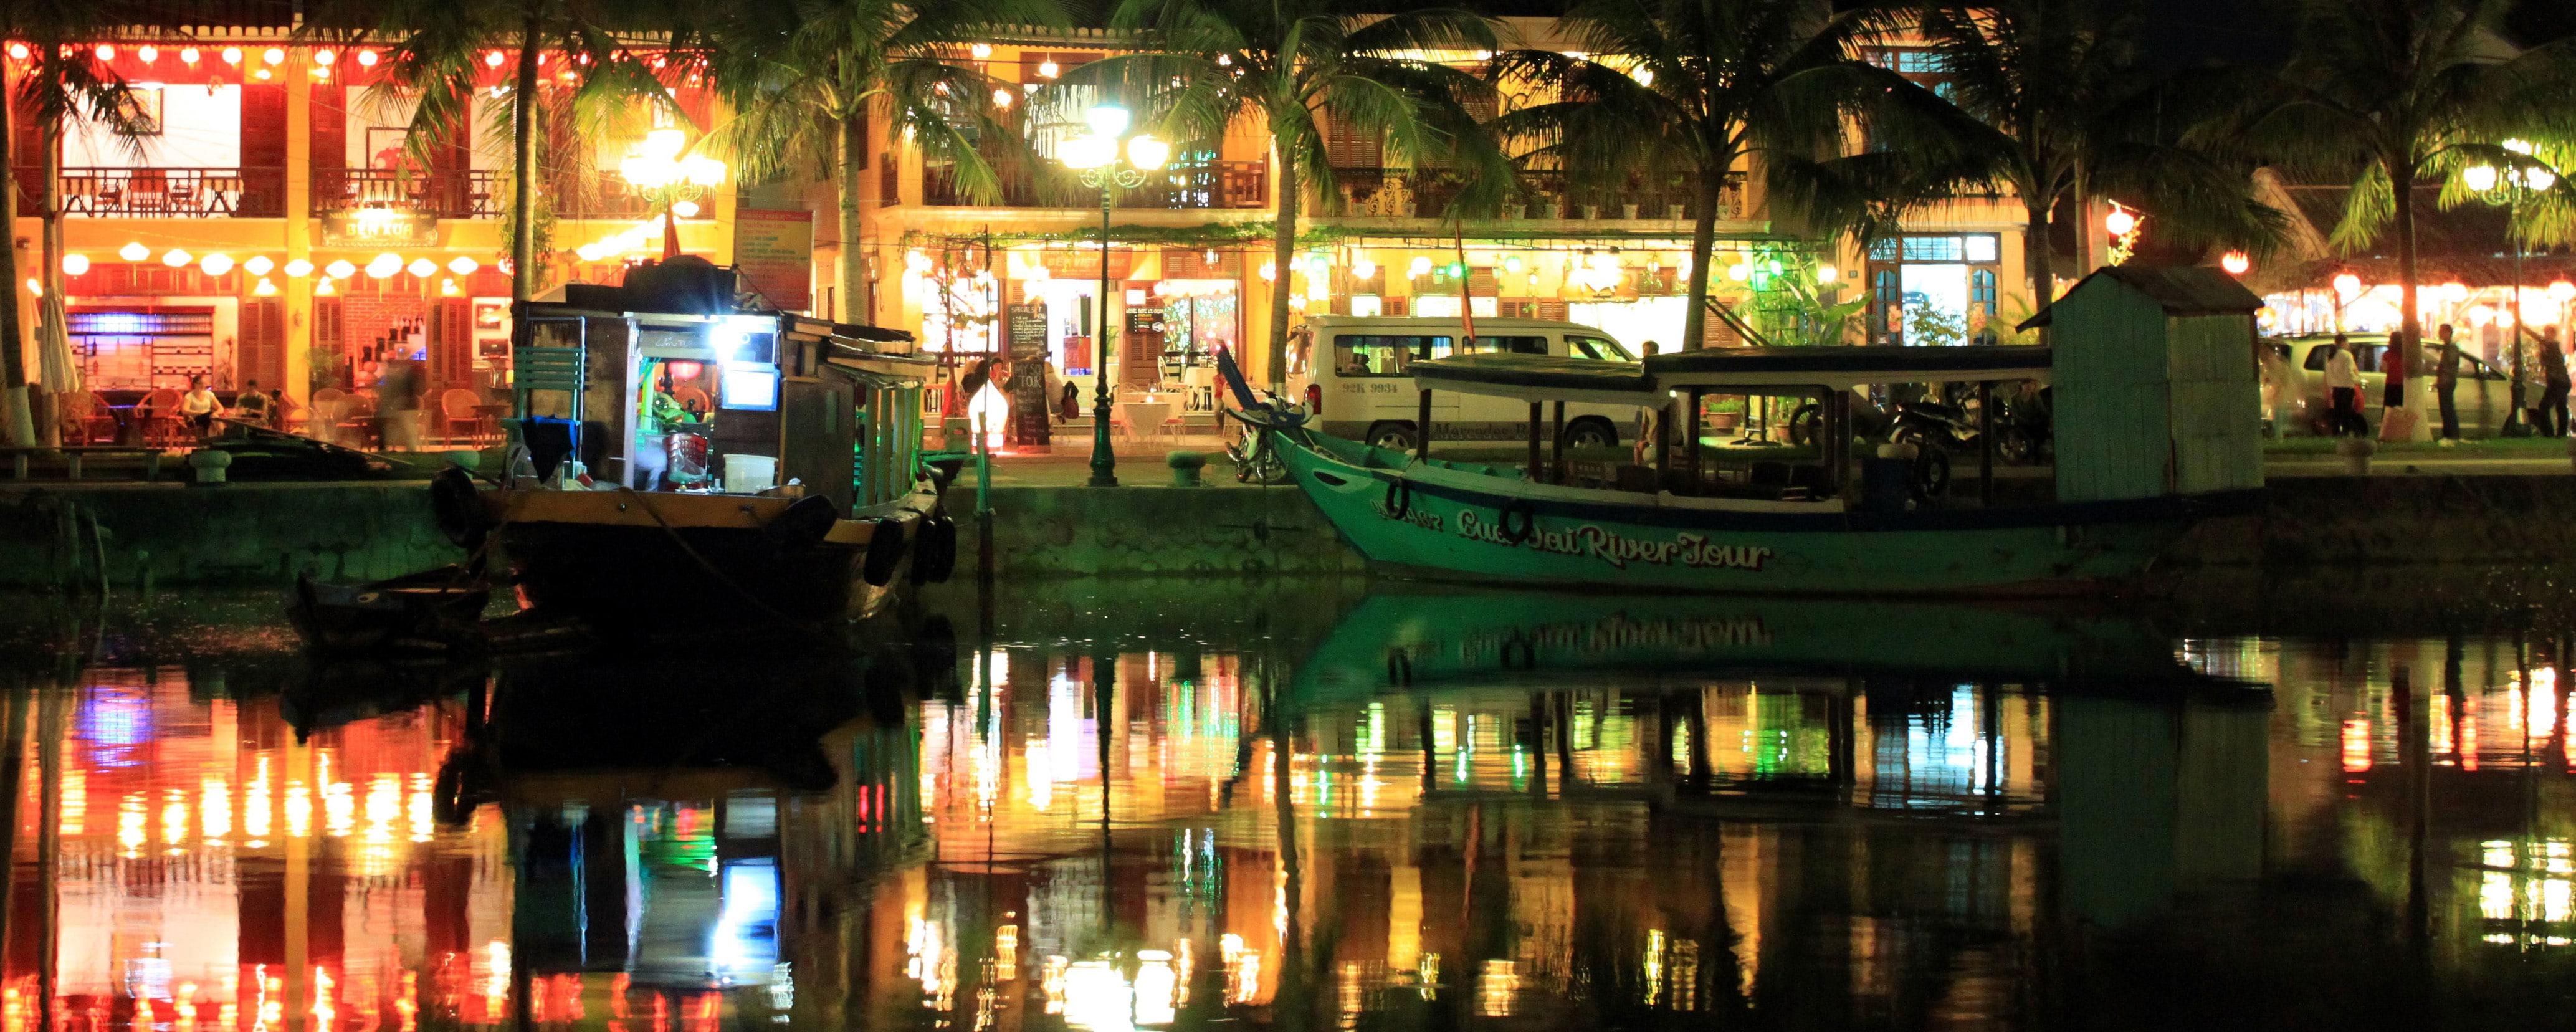 Hoi An Vietnam  city photos : hoi an 665